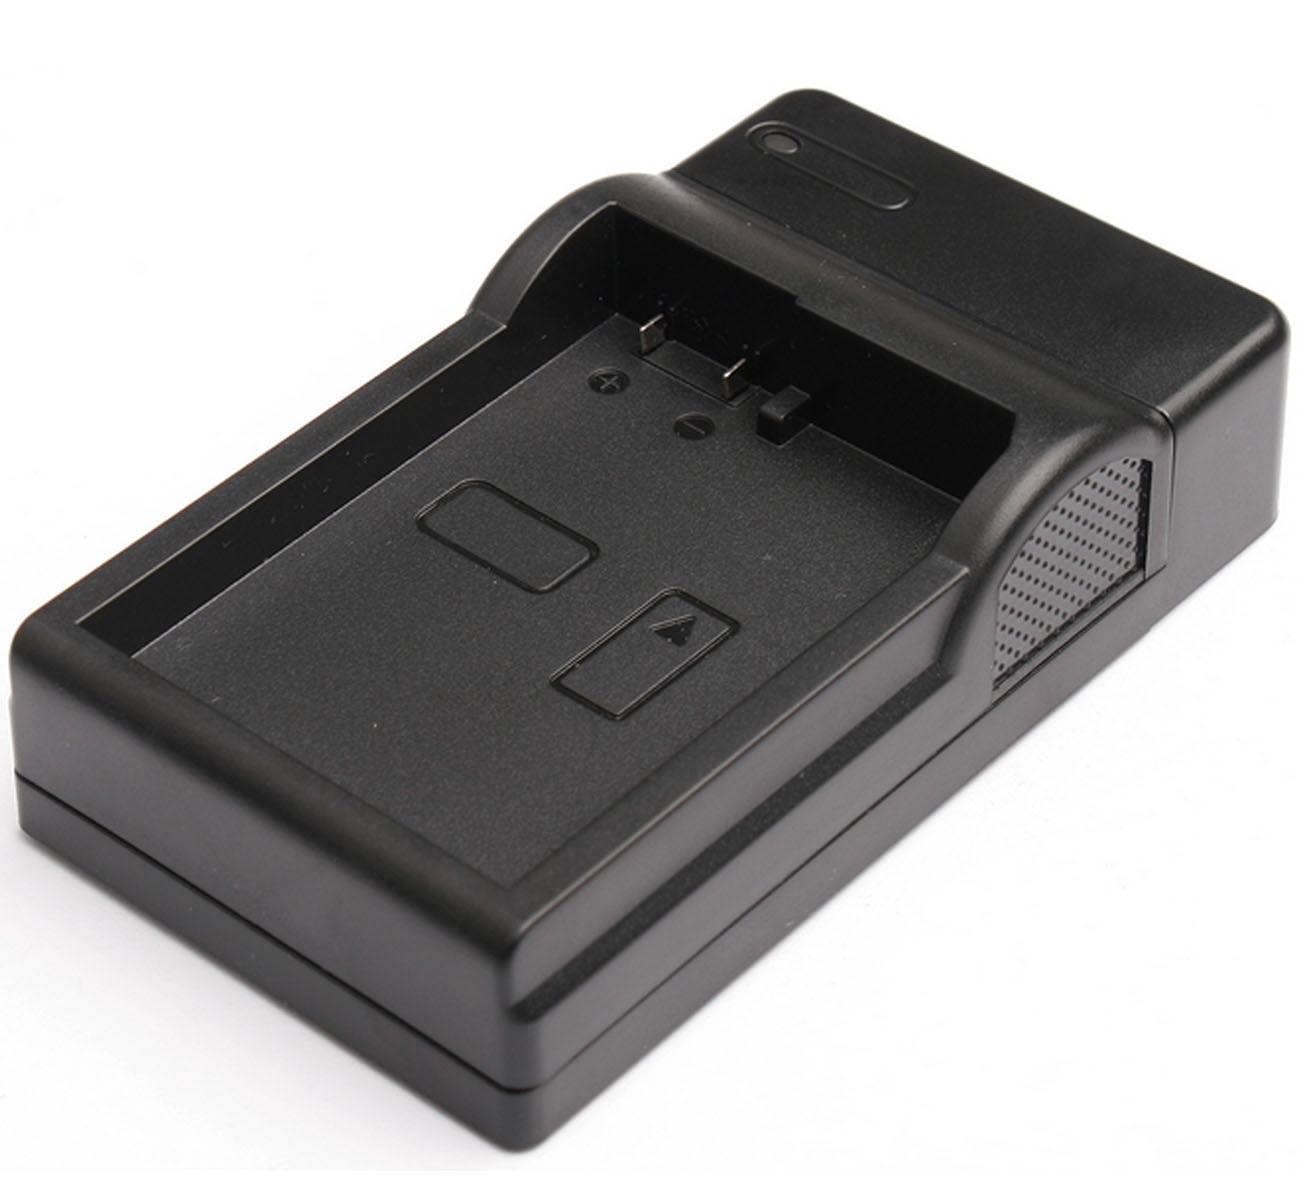 GZ-MG20EK GZ-MG20EX GZ-MG20EZ Digital Camcorder GZ-MG20EY Battery Charger for JVC Everio GZ-MG20E